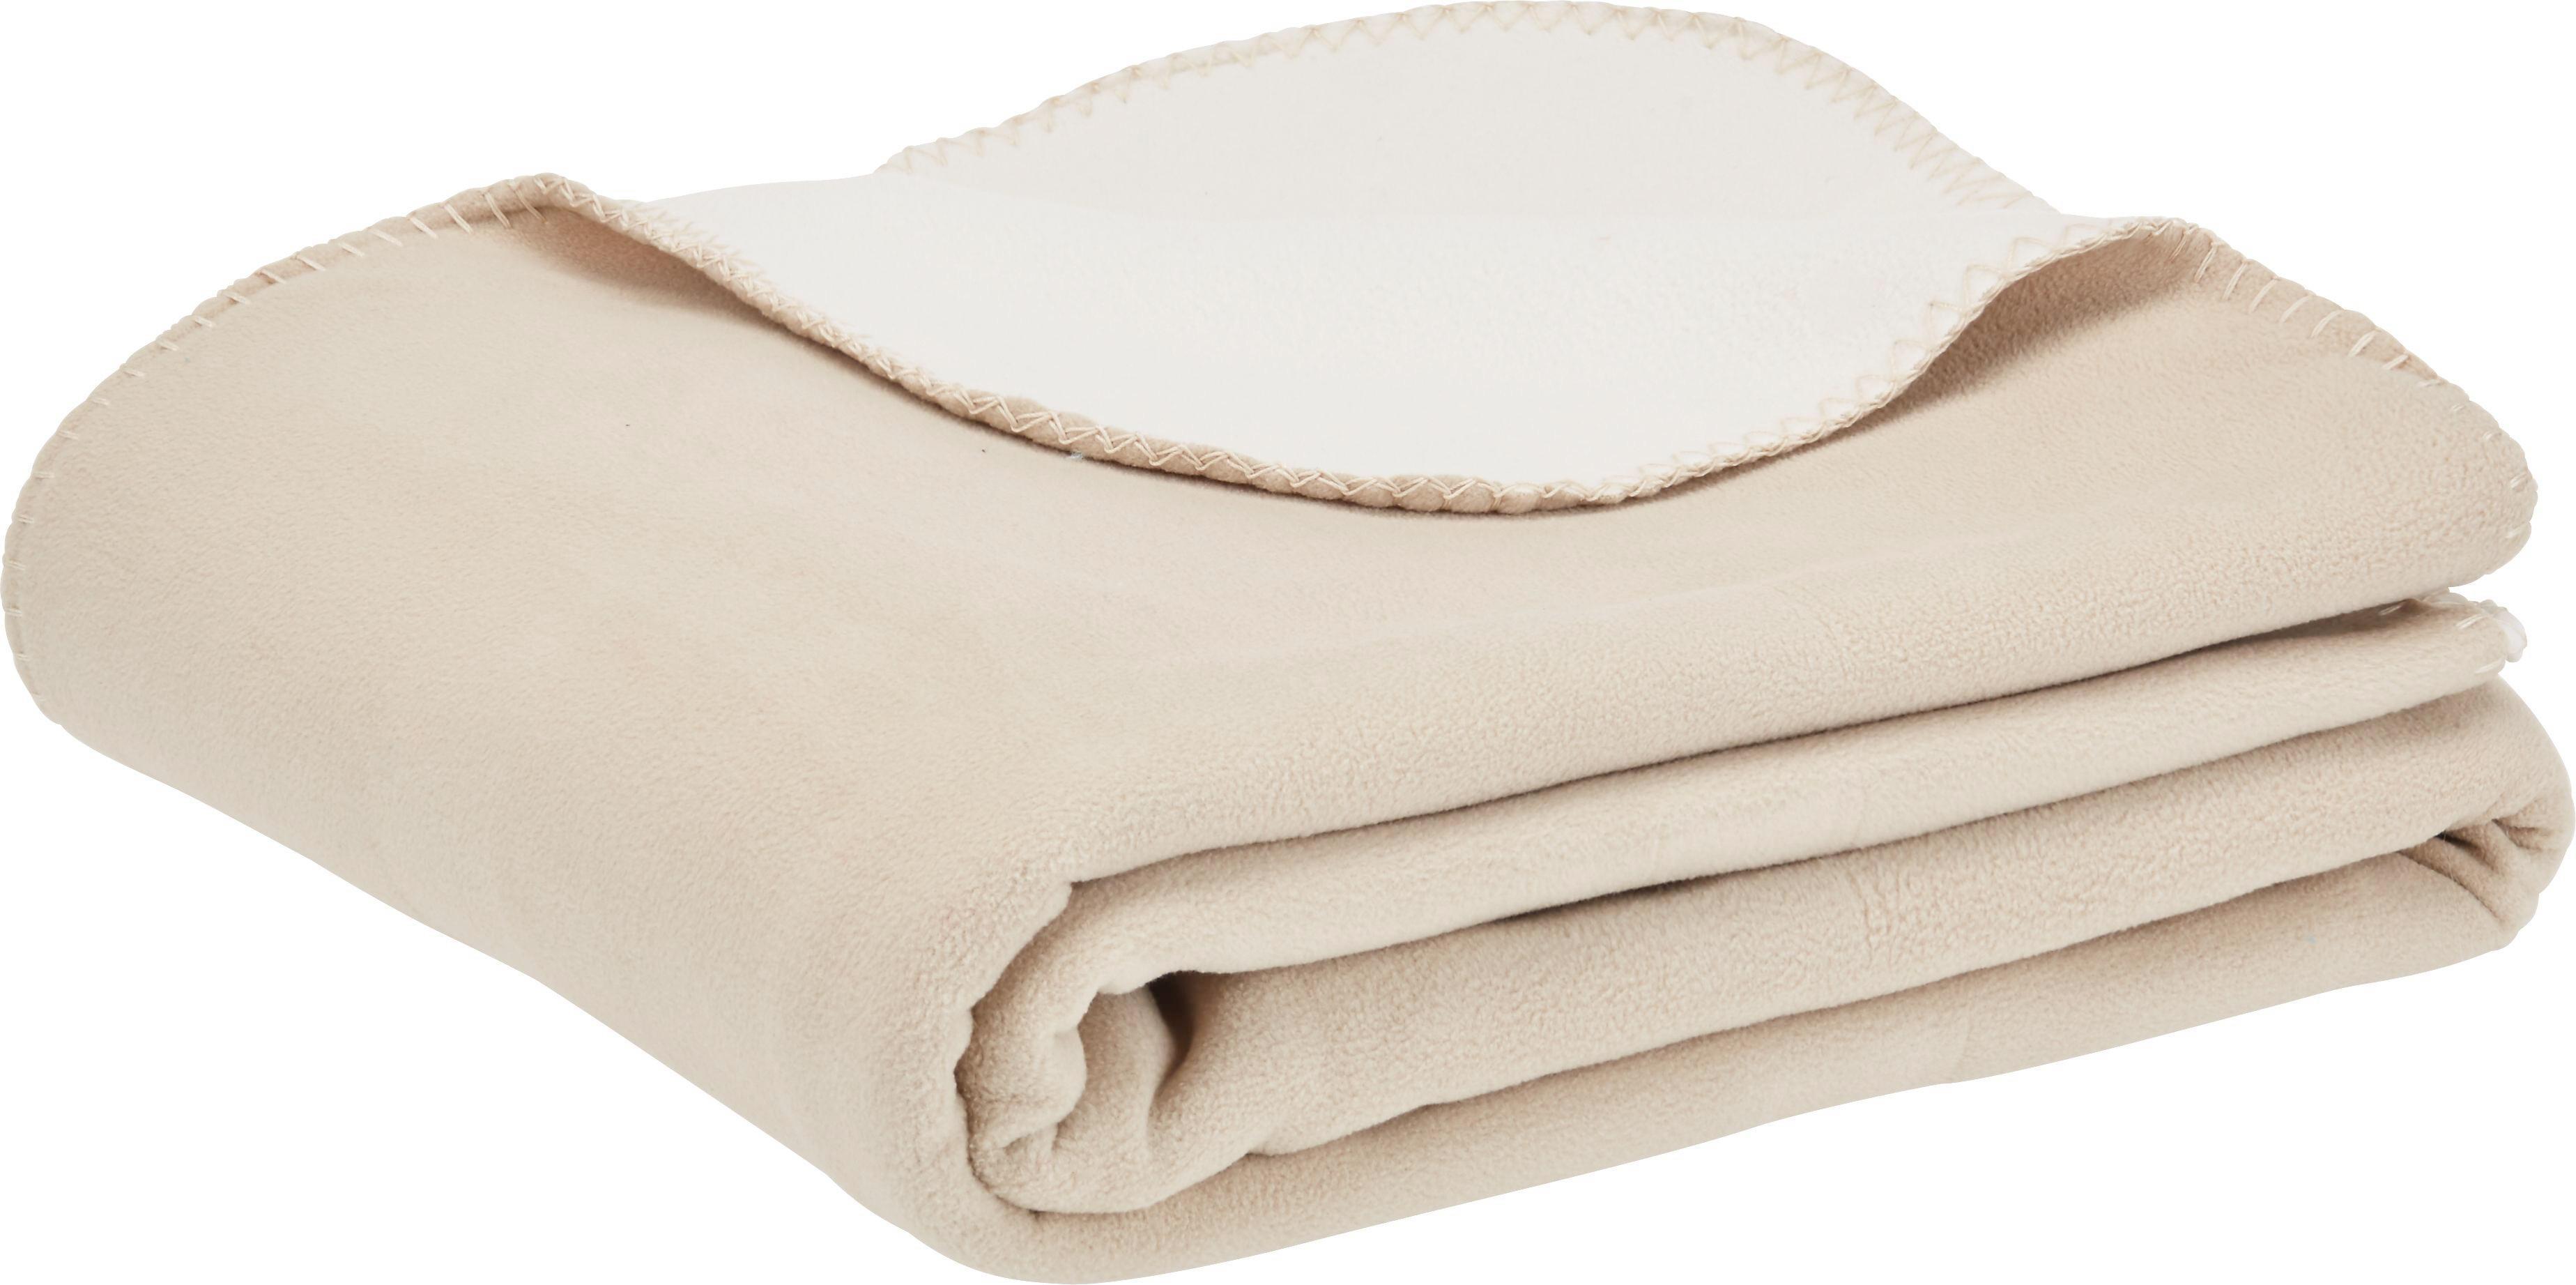 Polár Pléd Martin Wende - bézs/fehér, textil (150/200cm) - MÖMAX modern living